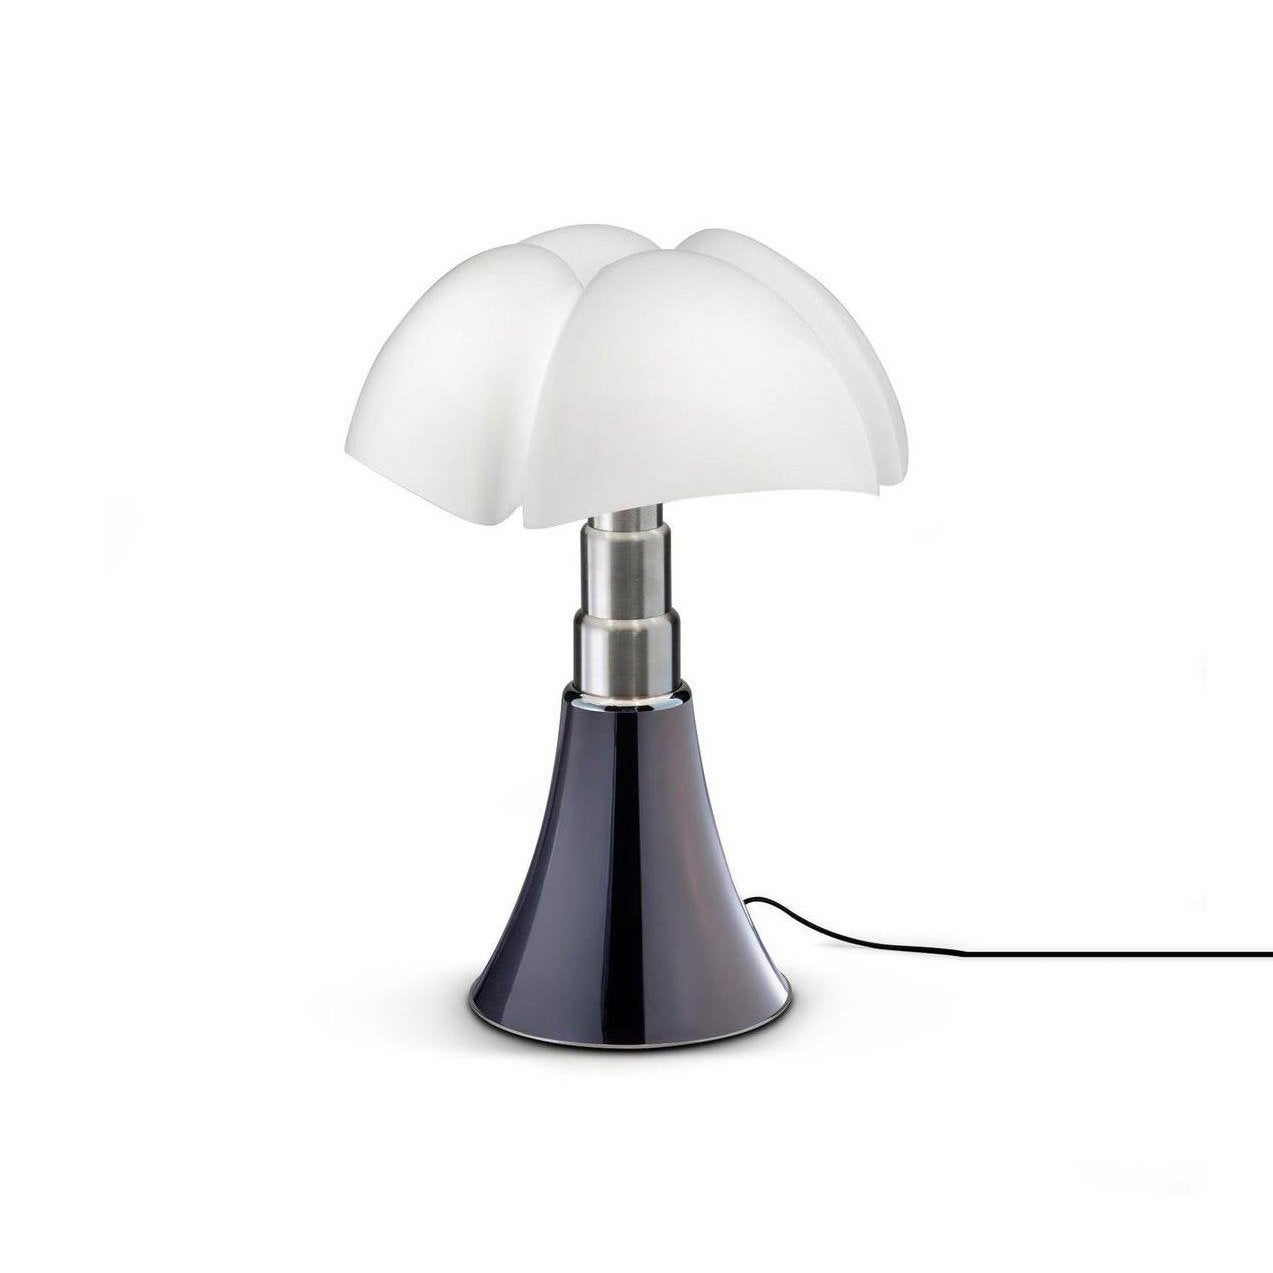 Lampe tactile, design, métal, MARTINELLI LUCE Mini pipistrello tit h35